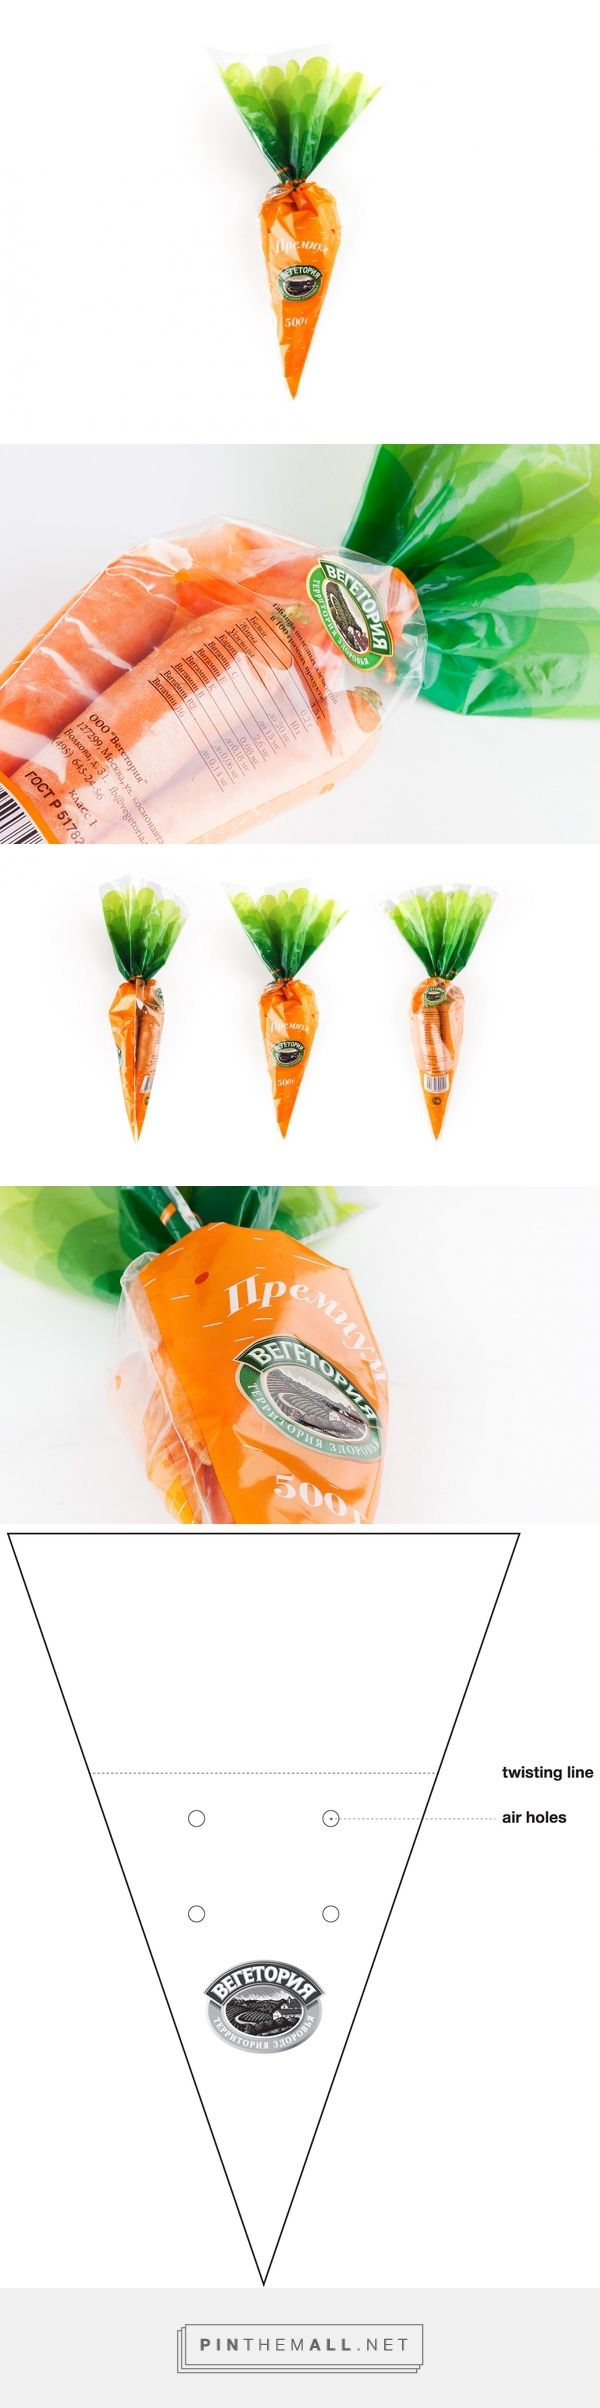 Vegetoria Carrot packaging design by Just Be Nice studio (Russia) - http://www.packagingoftheworld.com/2016/06/vegetoria-carrot.html